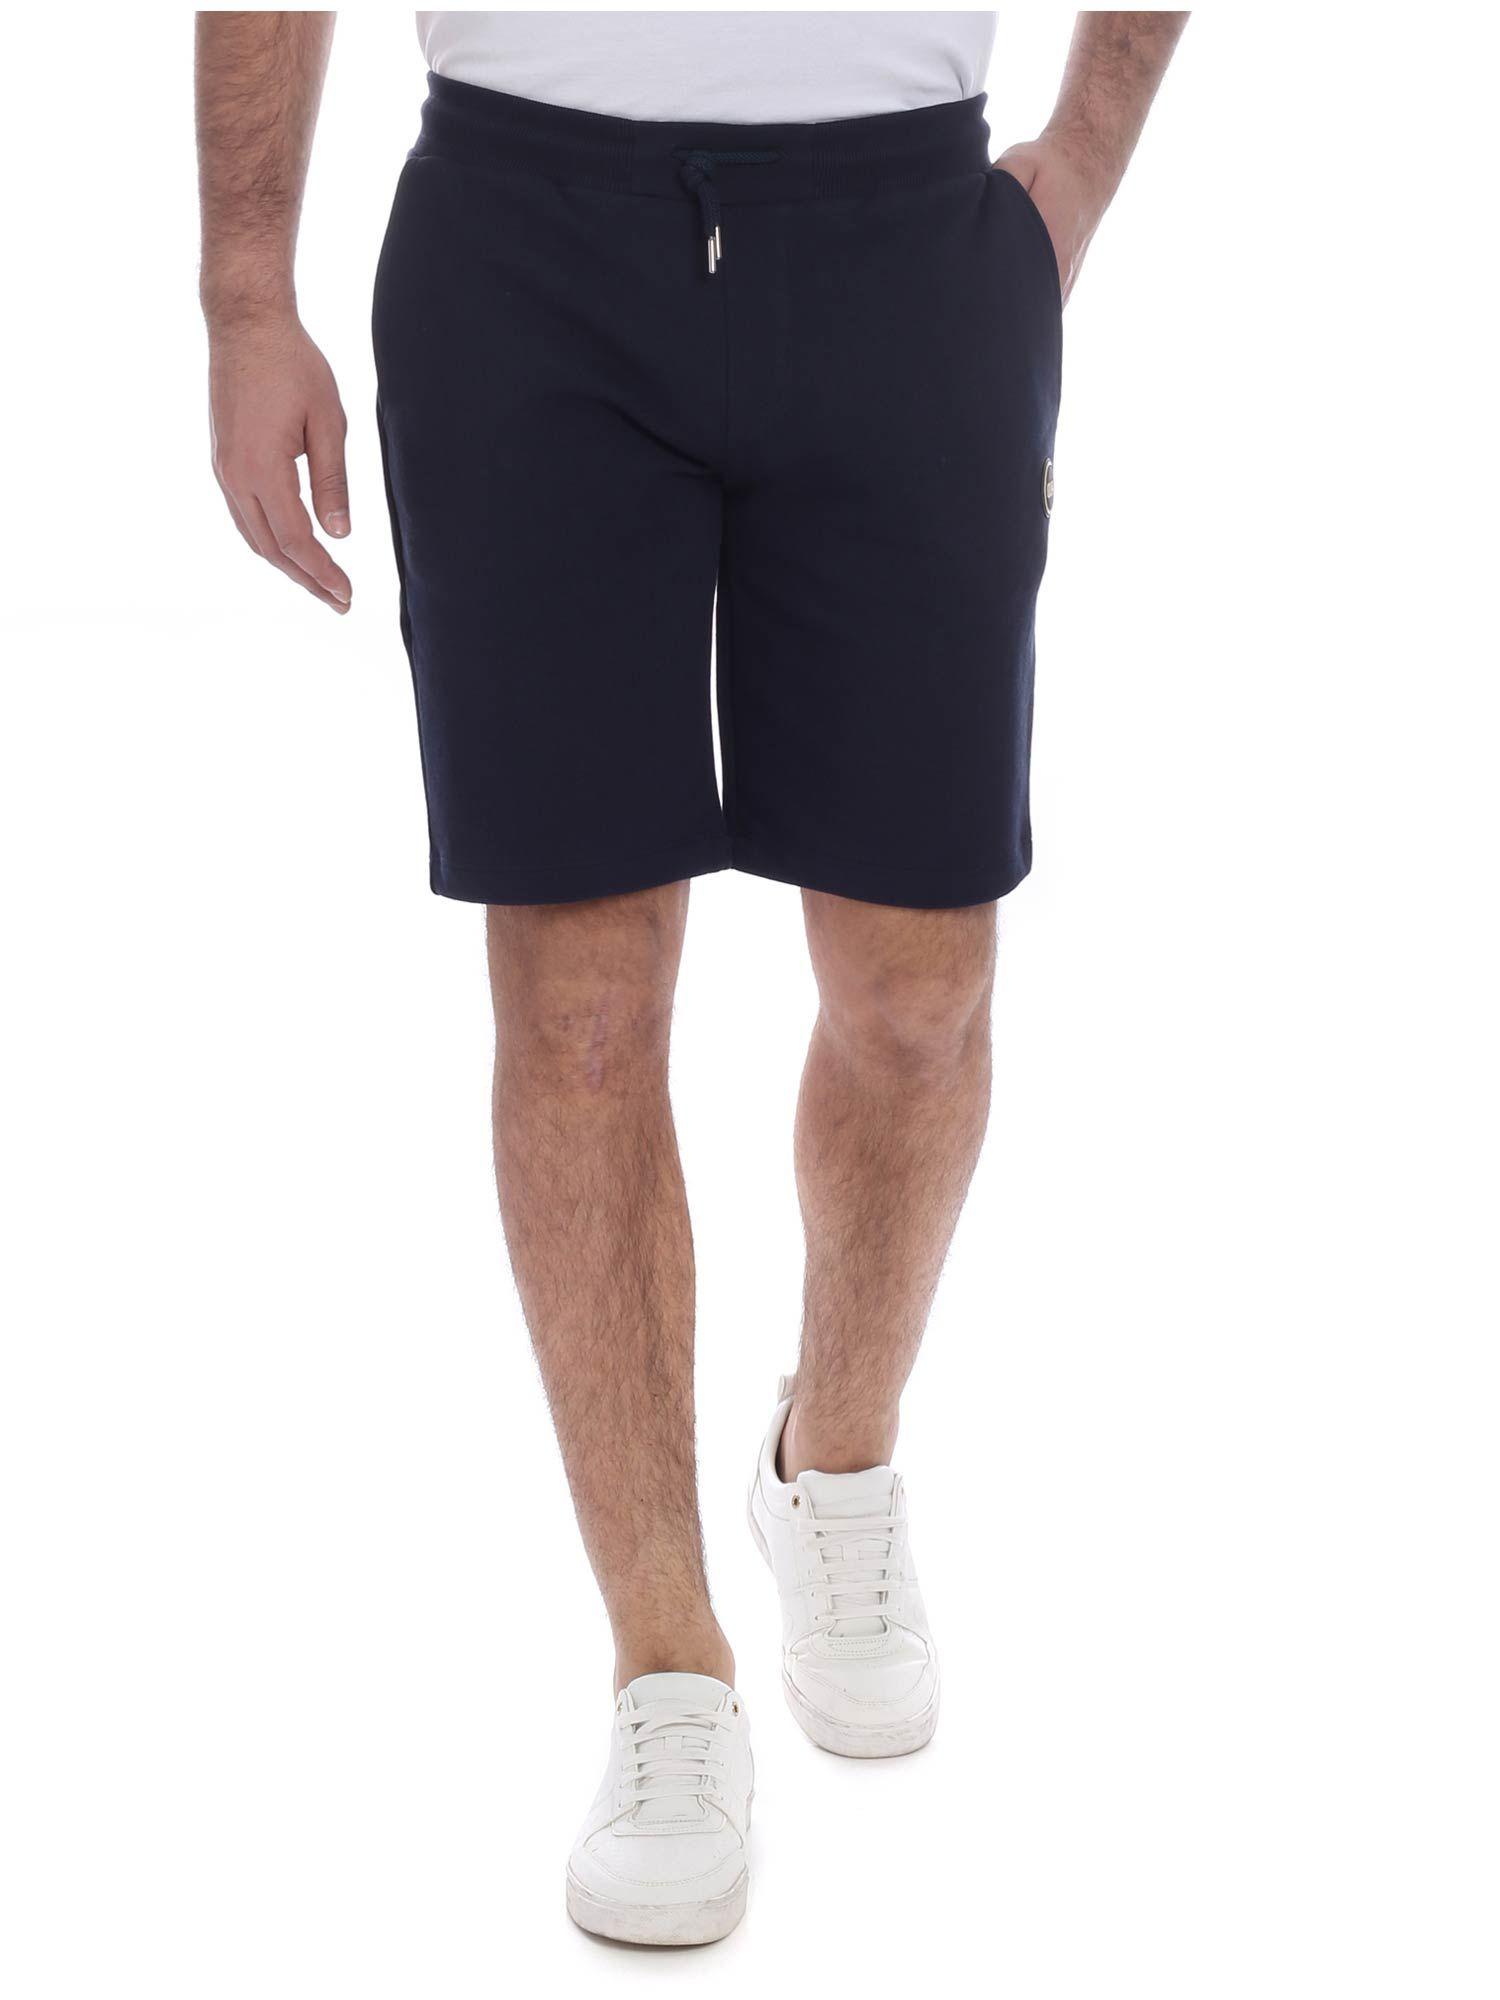 Colmar Originals Men's Blue Cotton Shorts